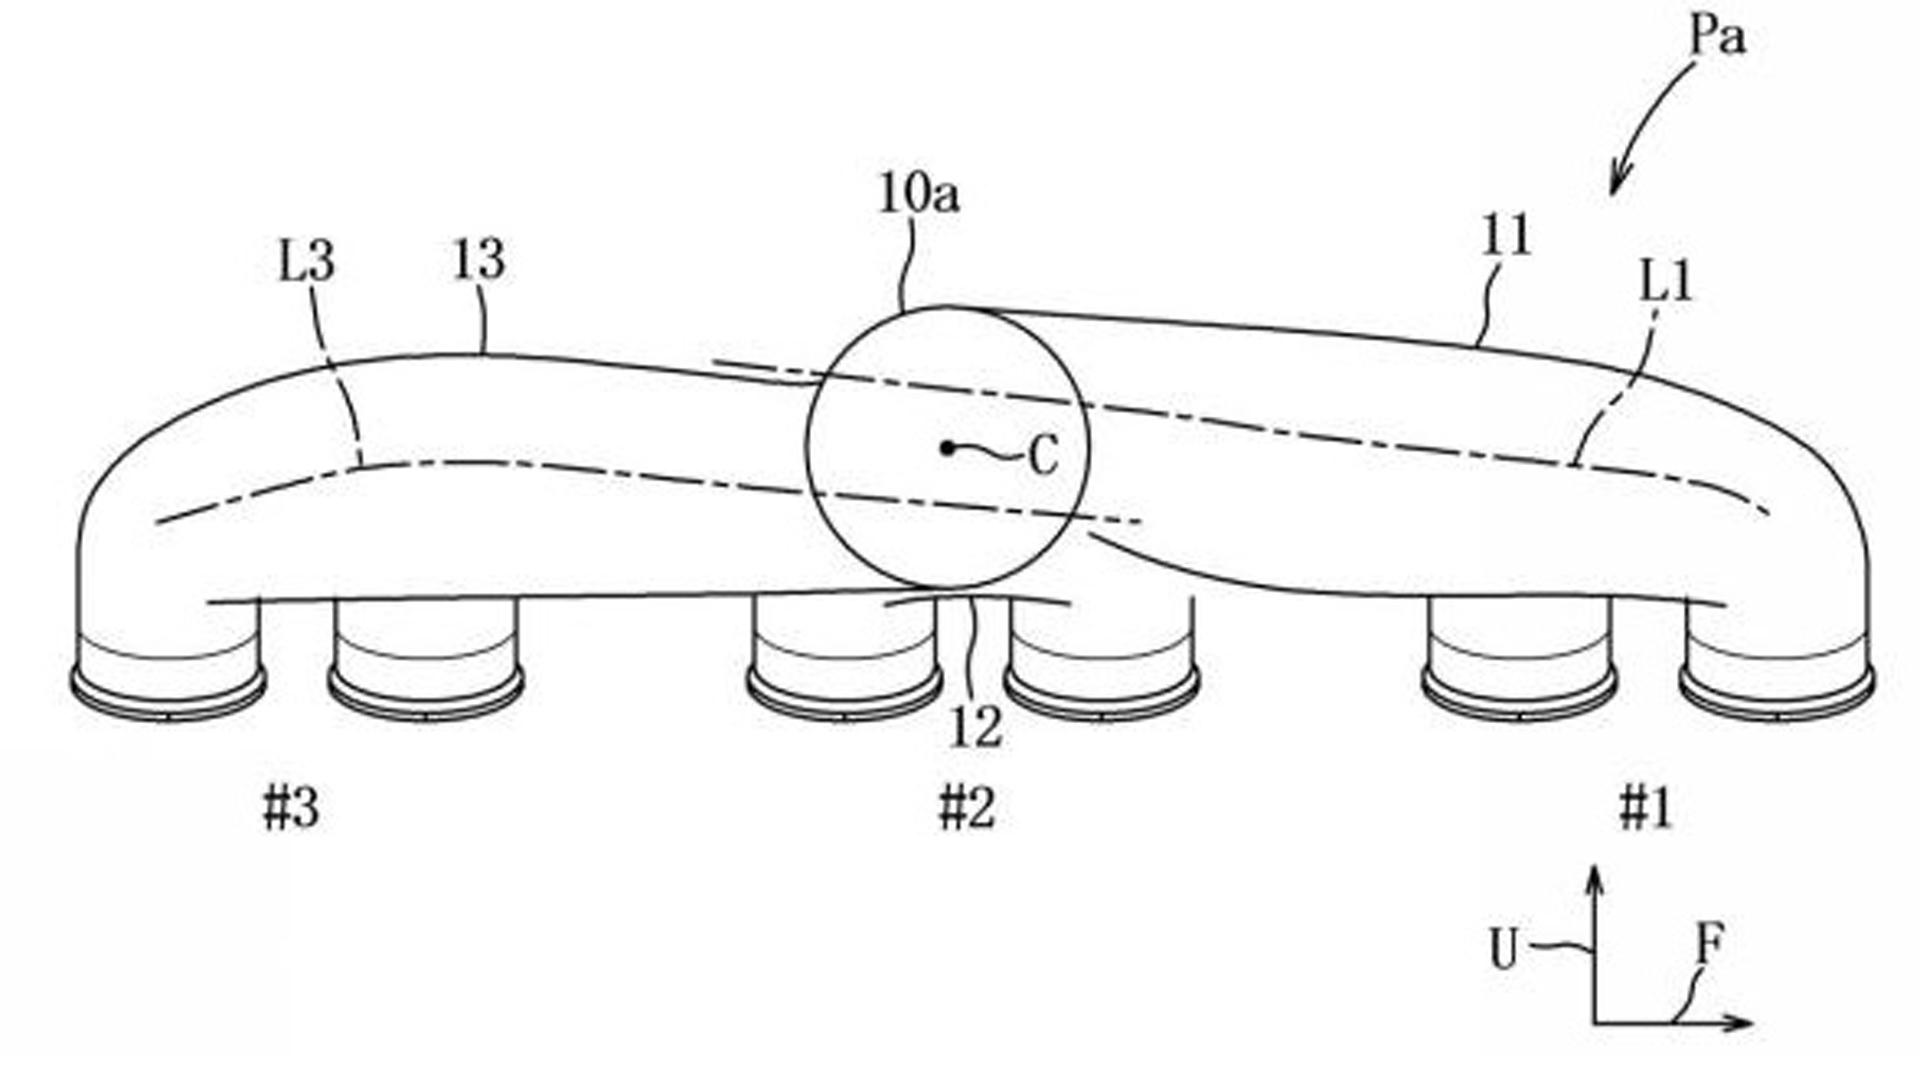 Mazda-engine-gearbox-patents-5